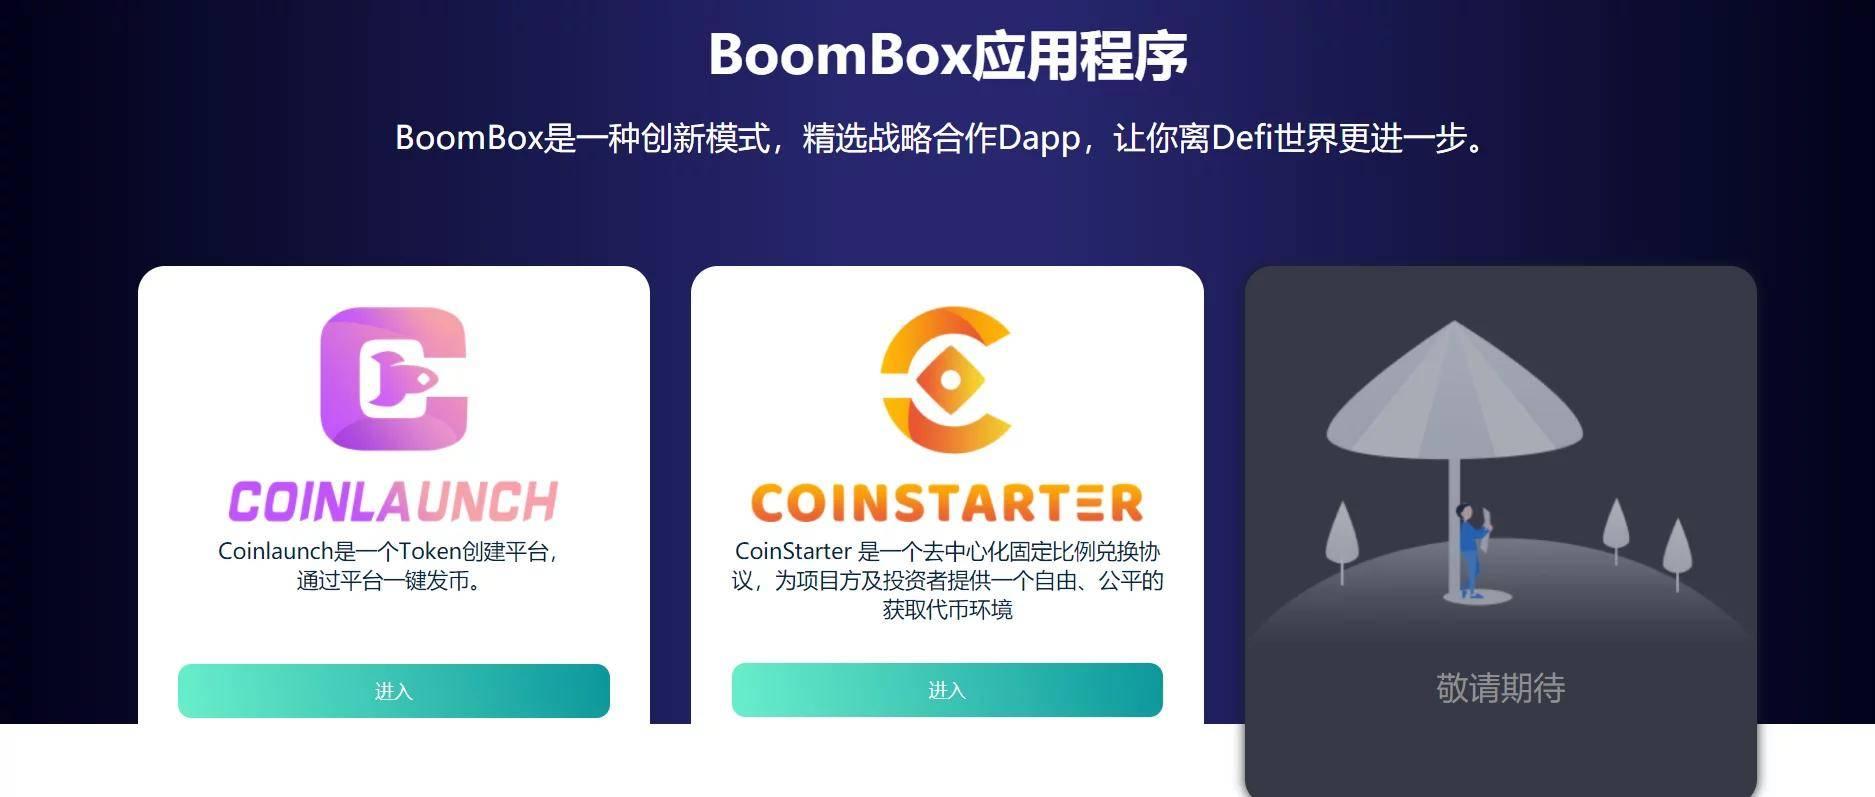 YouSwap一键发币,助力项目快速启动  第2张 YouSwap一键发币,助力项目快速启动 币圈信息